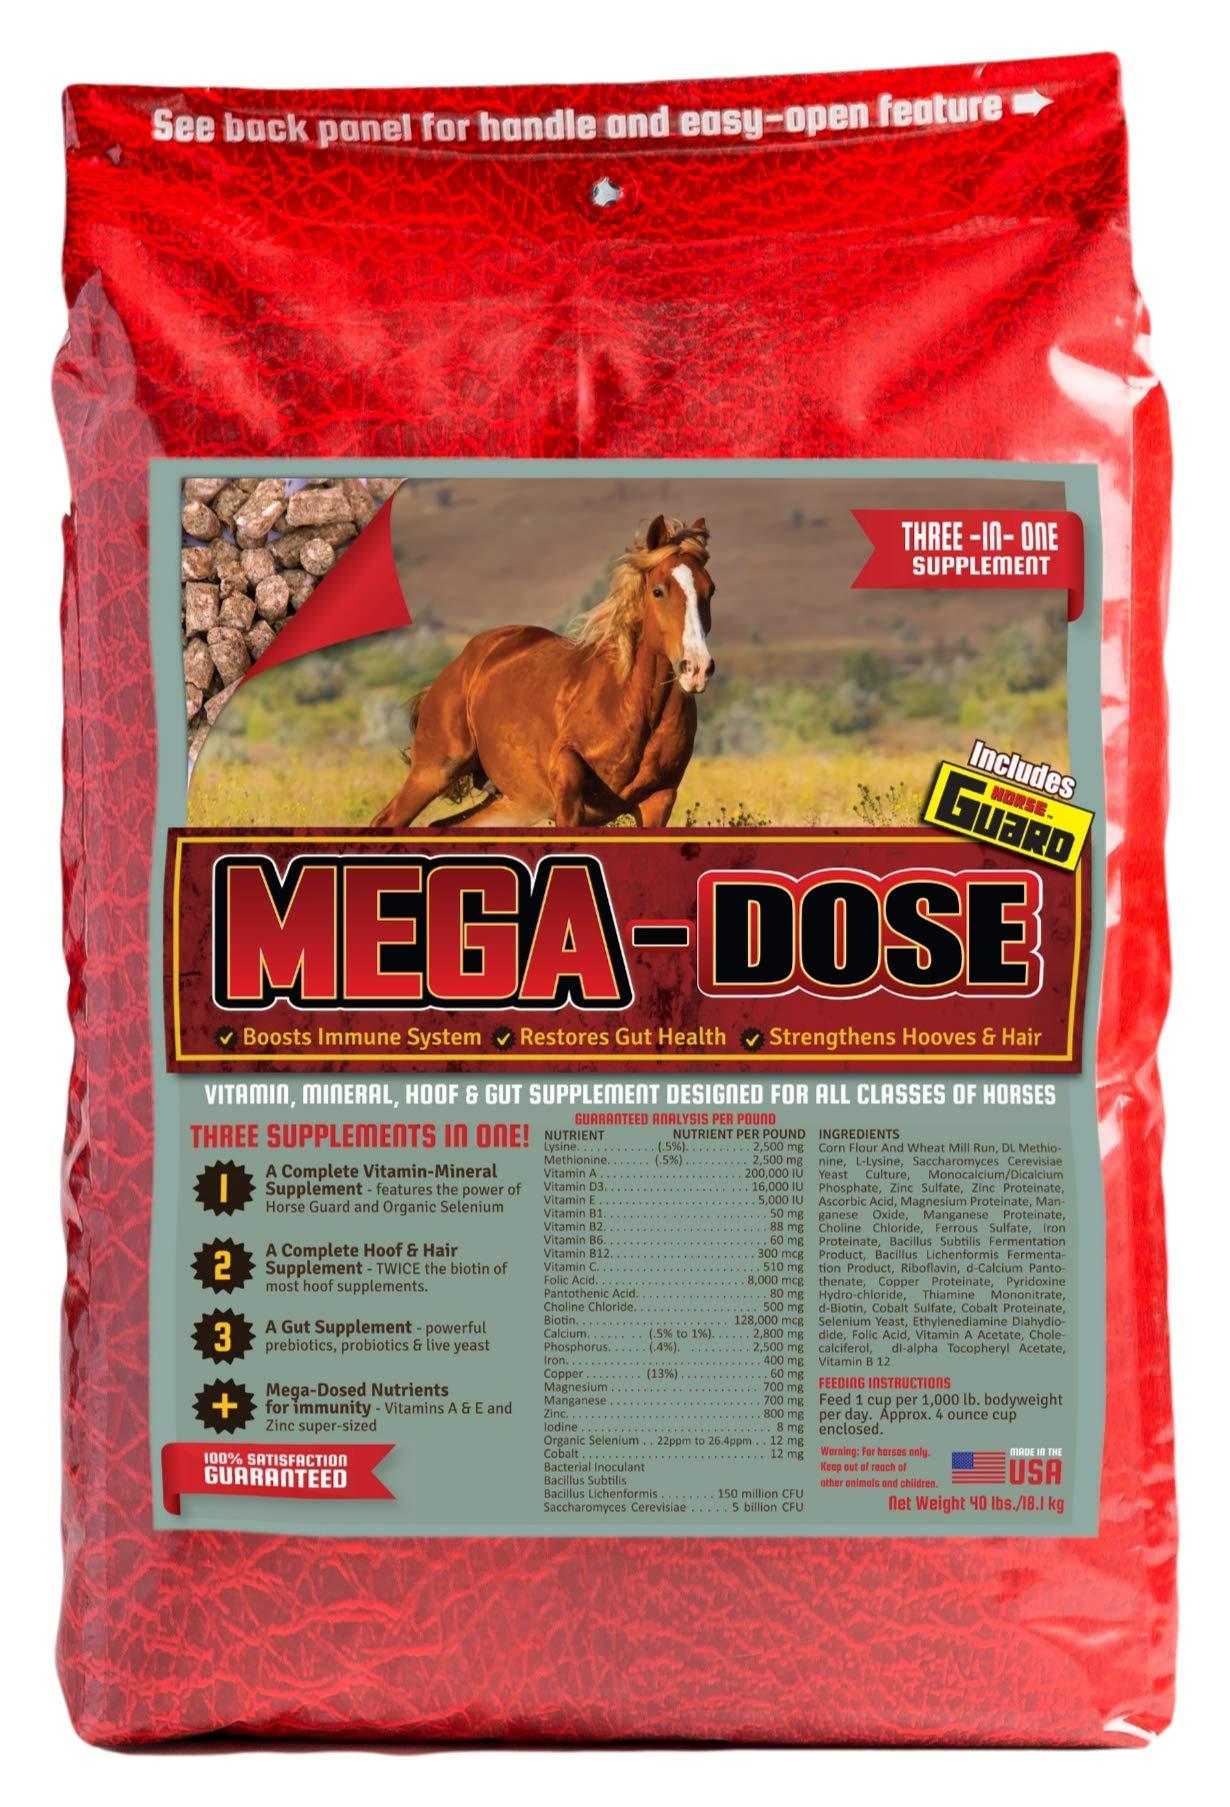 Horse Guard Mega Dose Equine Vitamin Mineral Hoof & Probiotic Supplement, 40 lb by Horse Guard (Image #1)